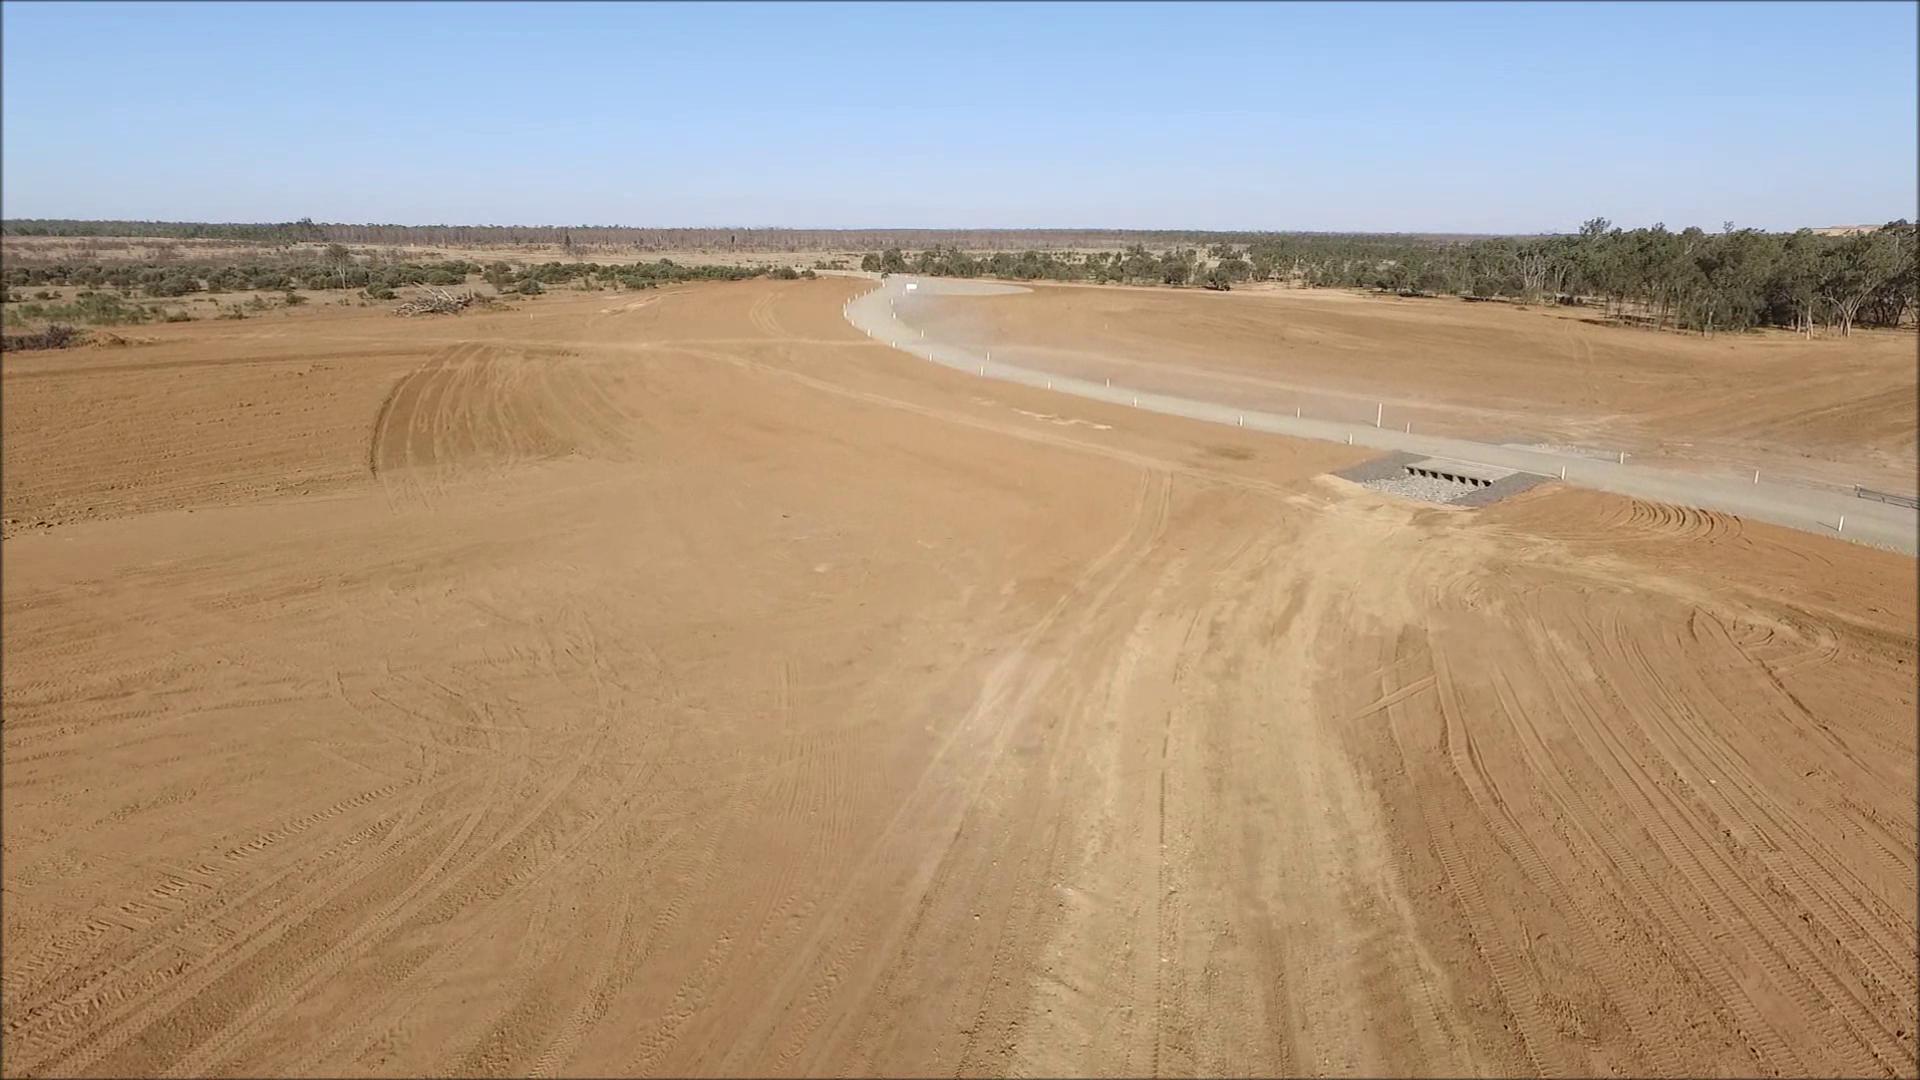 Foxleigh Mine - Cockatoo Creek Diversion Levee Pavement Construction